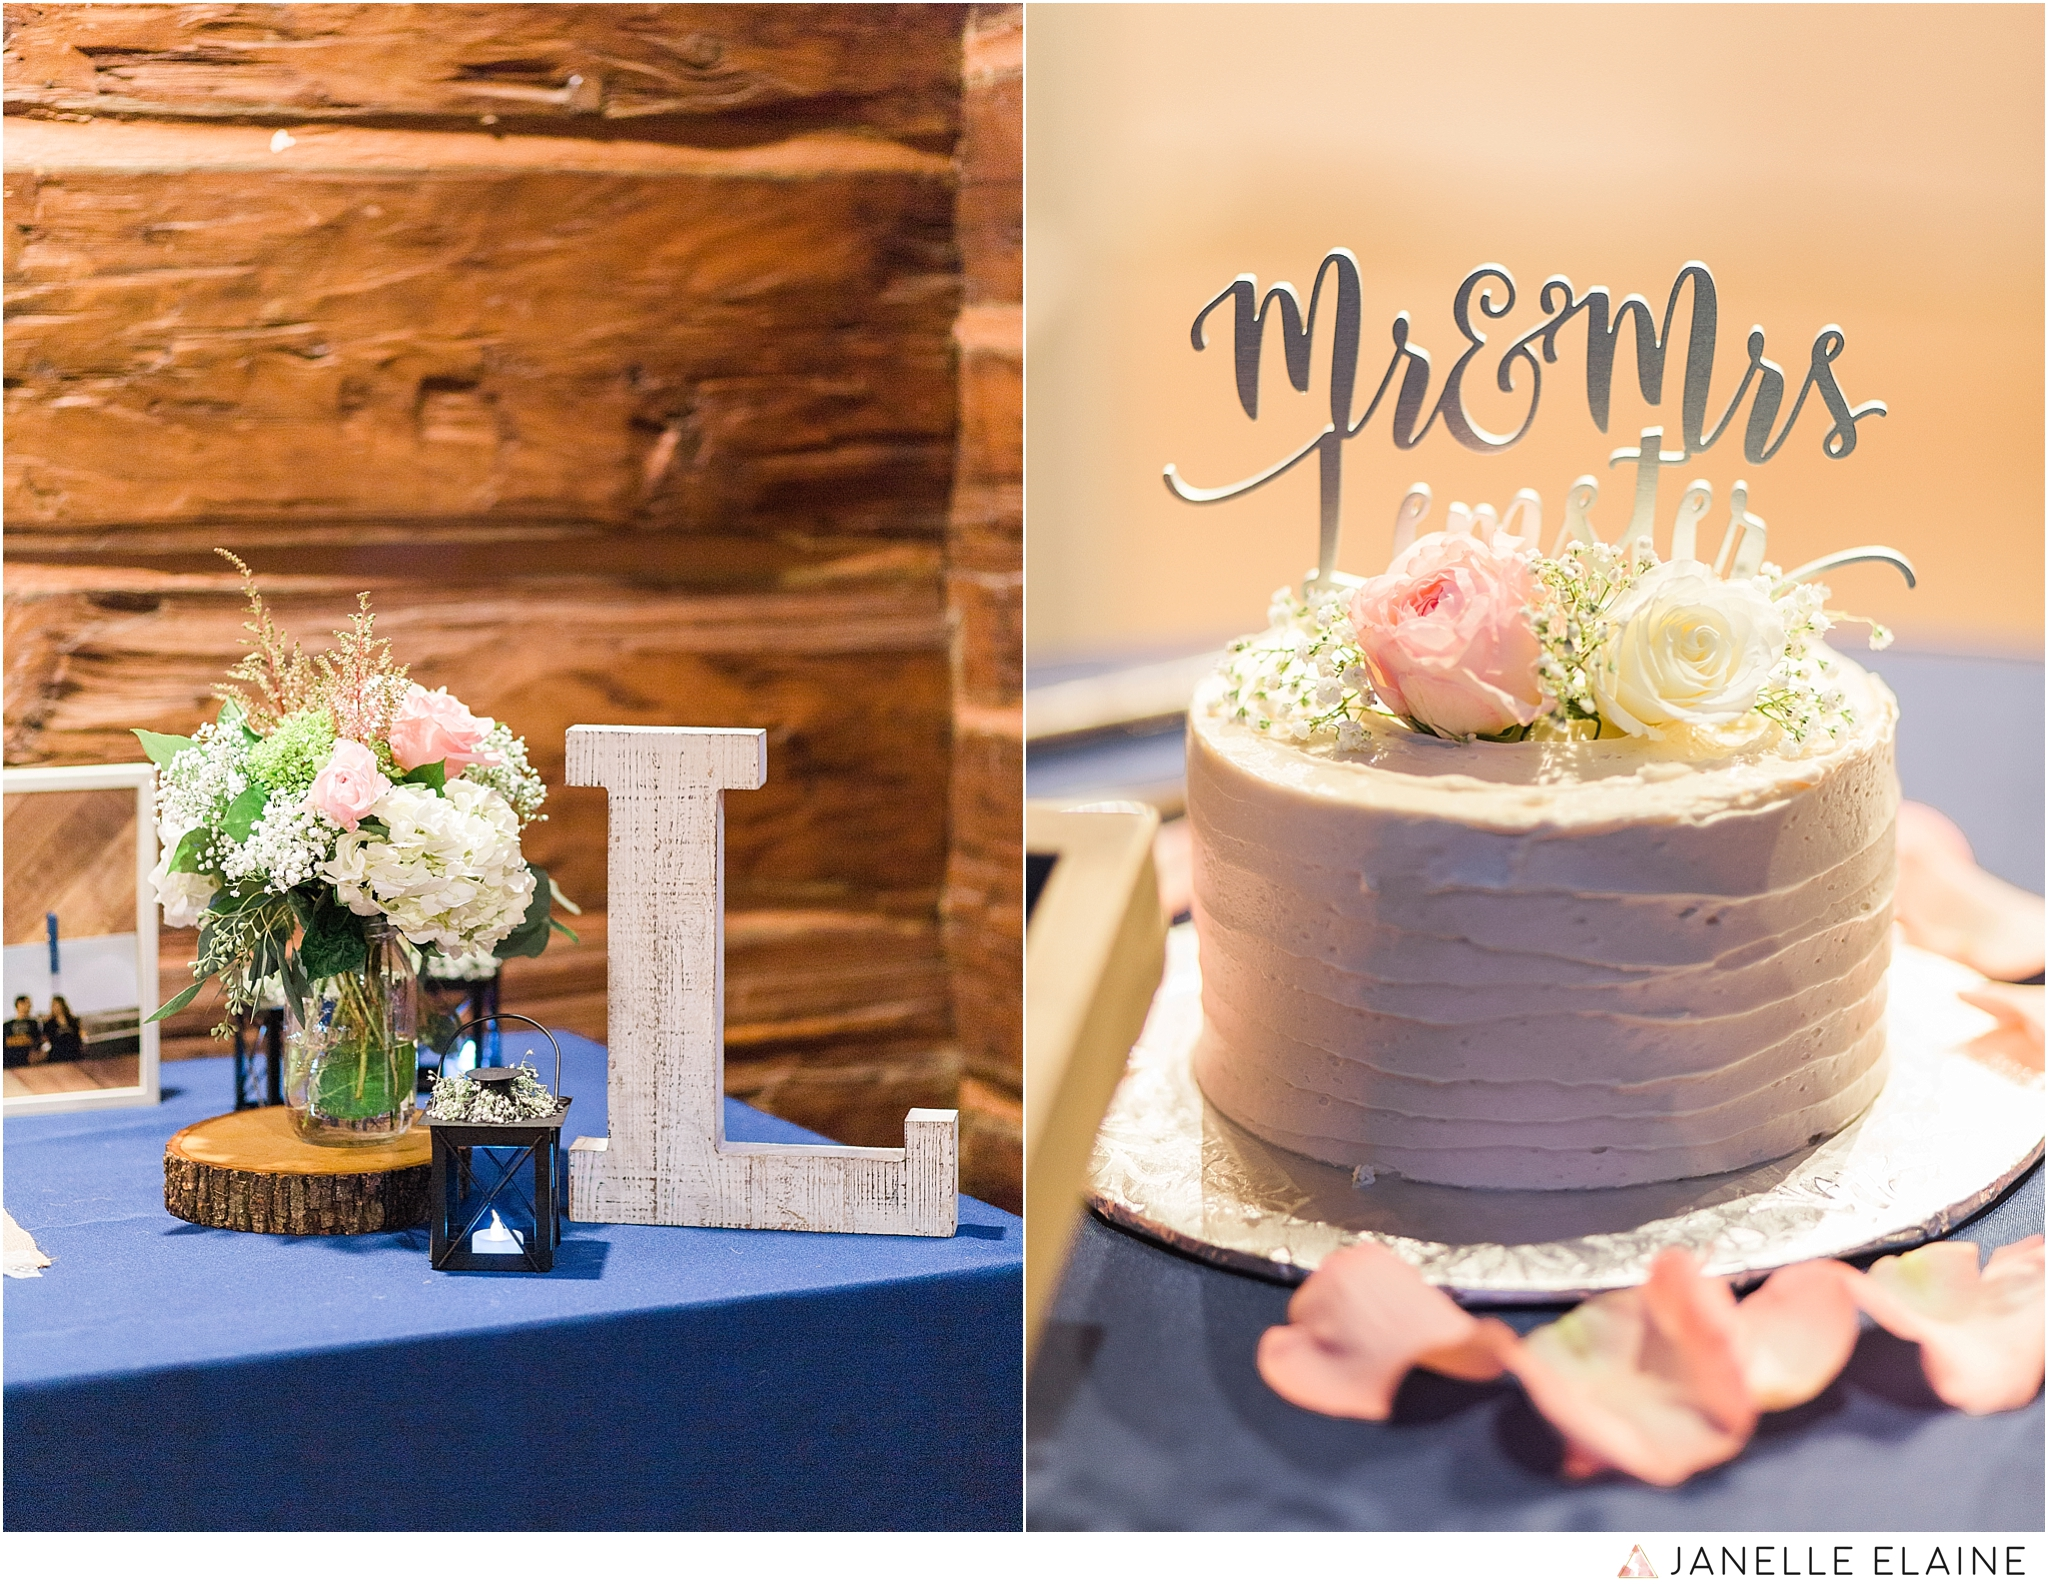 janelle elaine photography-professional wedding photographer-seattle-bellevue-robinswood house-264.jpg